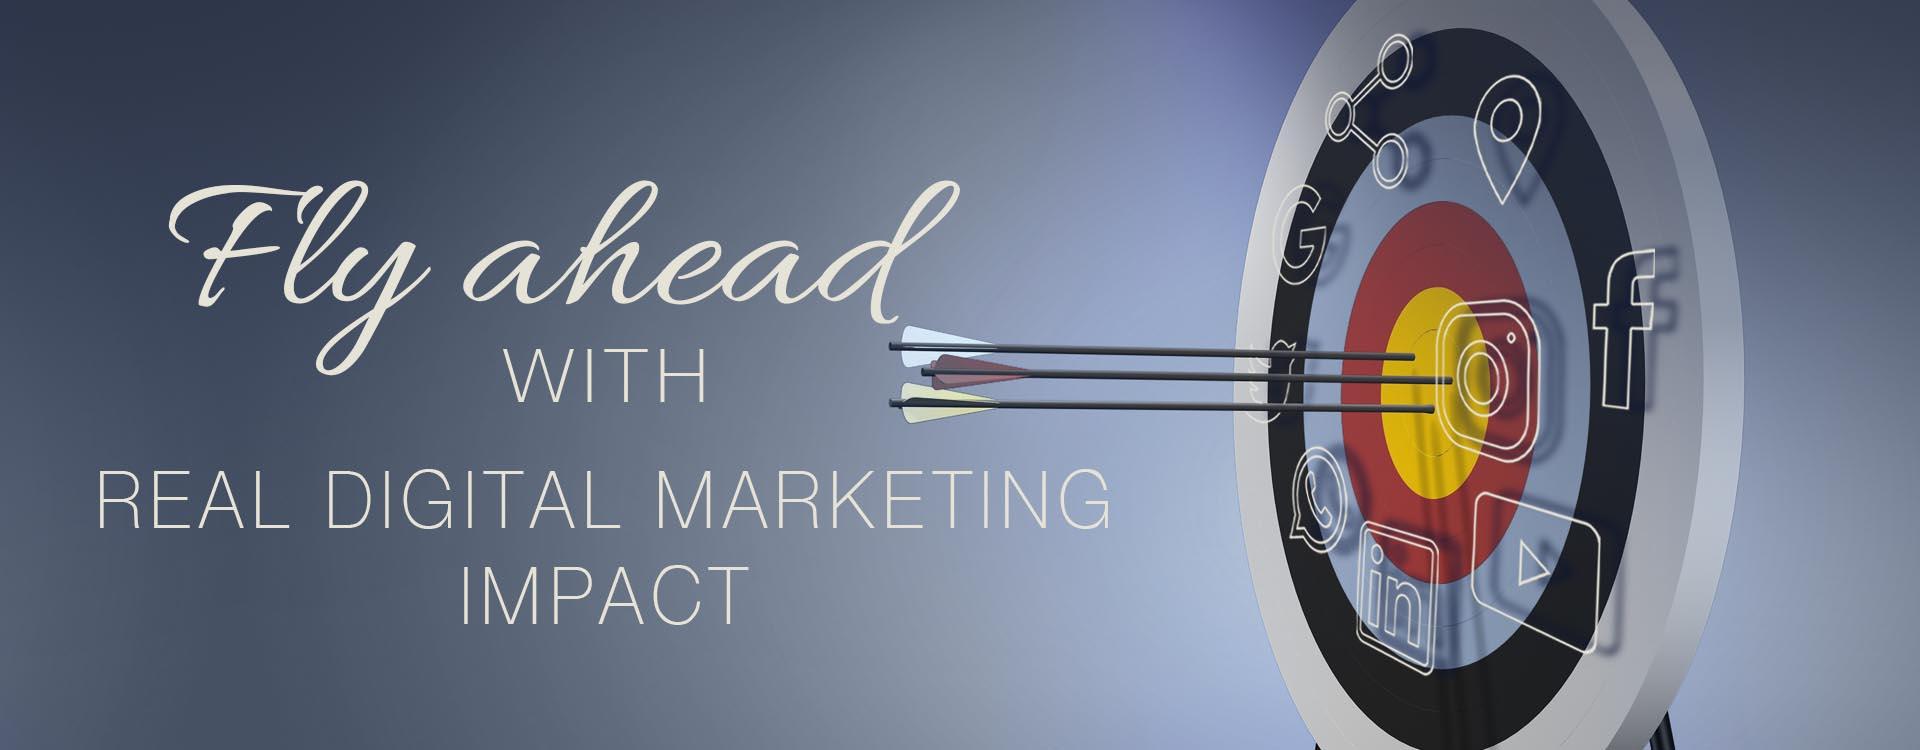 Digital Marketing with Impact